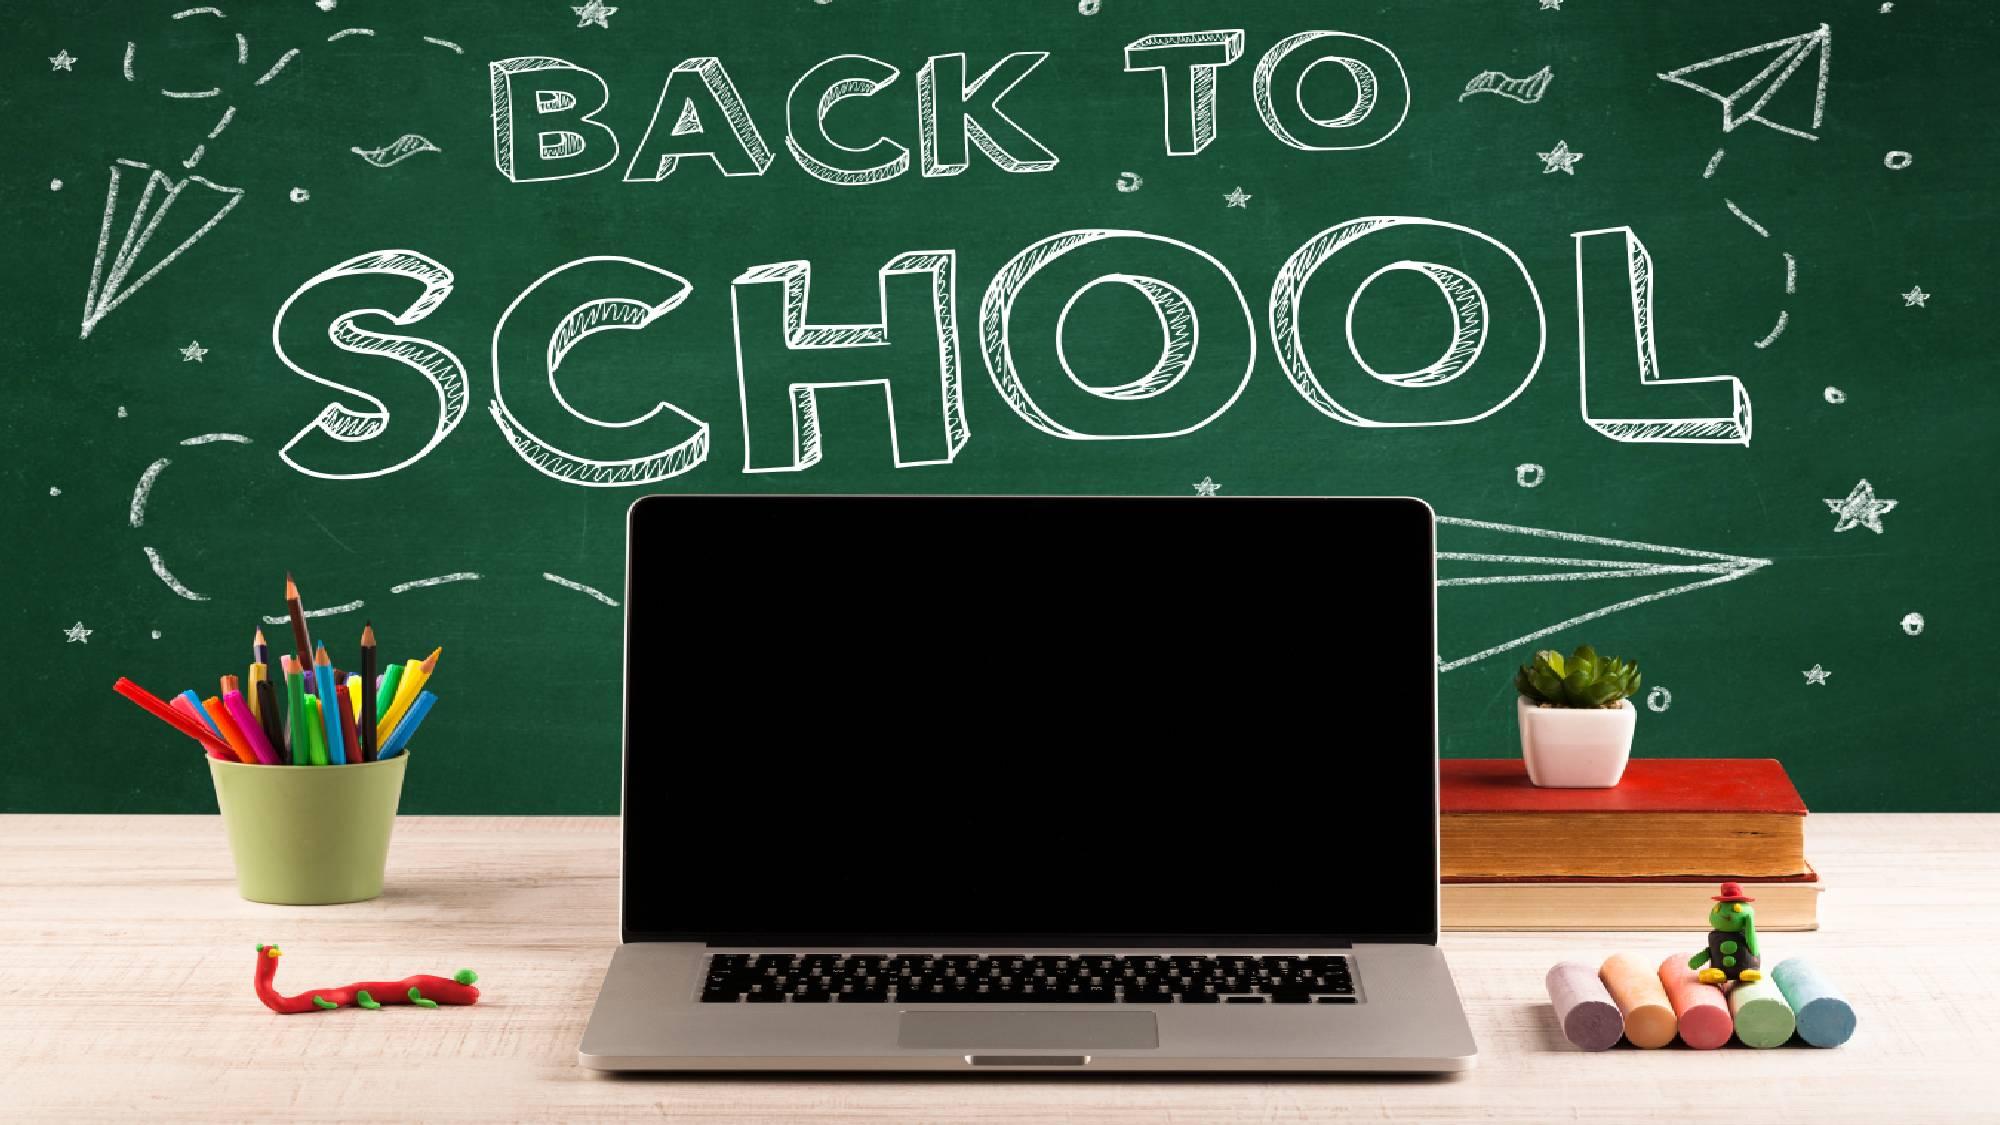 Christmas Bestbuy Laptop 2020 Deals Best back to school sales 2020: Deals at Best Buy, Apple and more